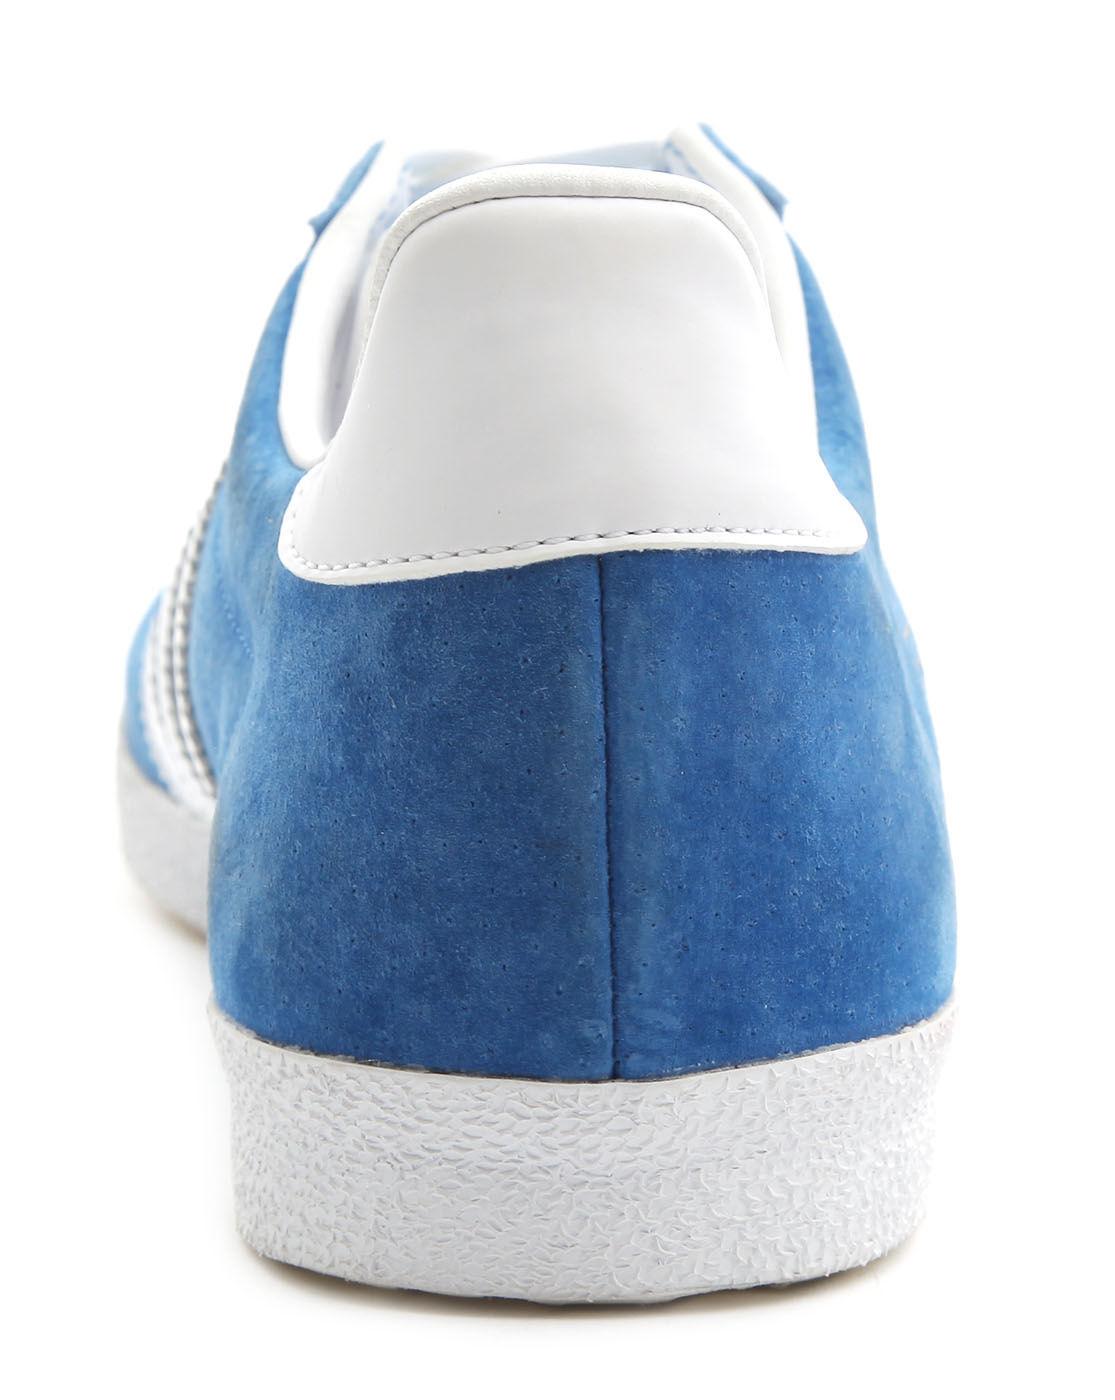 Adidas Originals Gazelle Og Navy Blue Sporty Sneakers